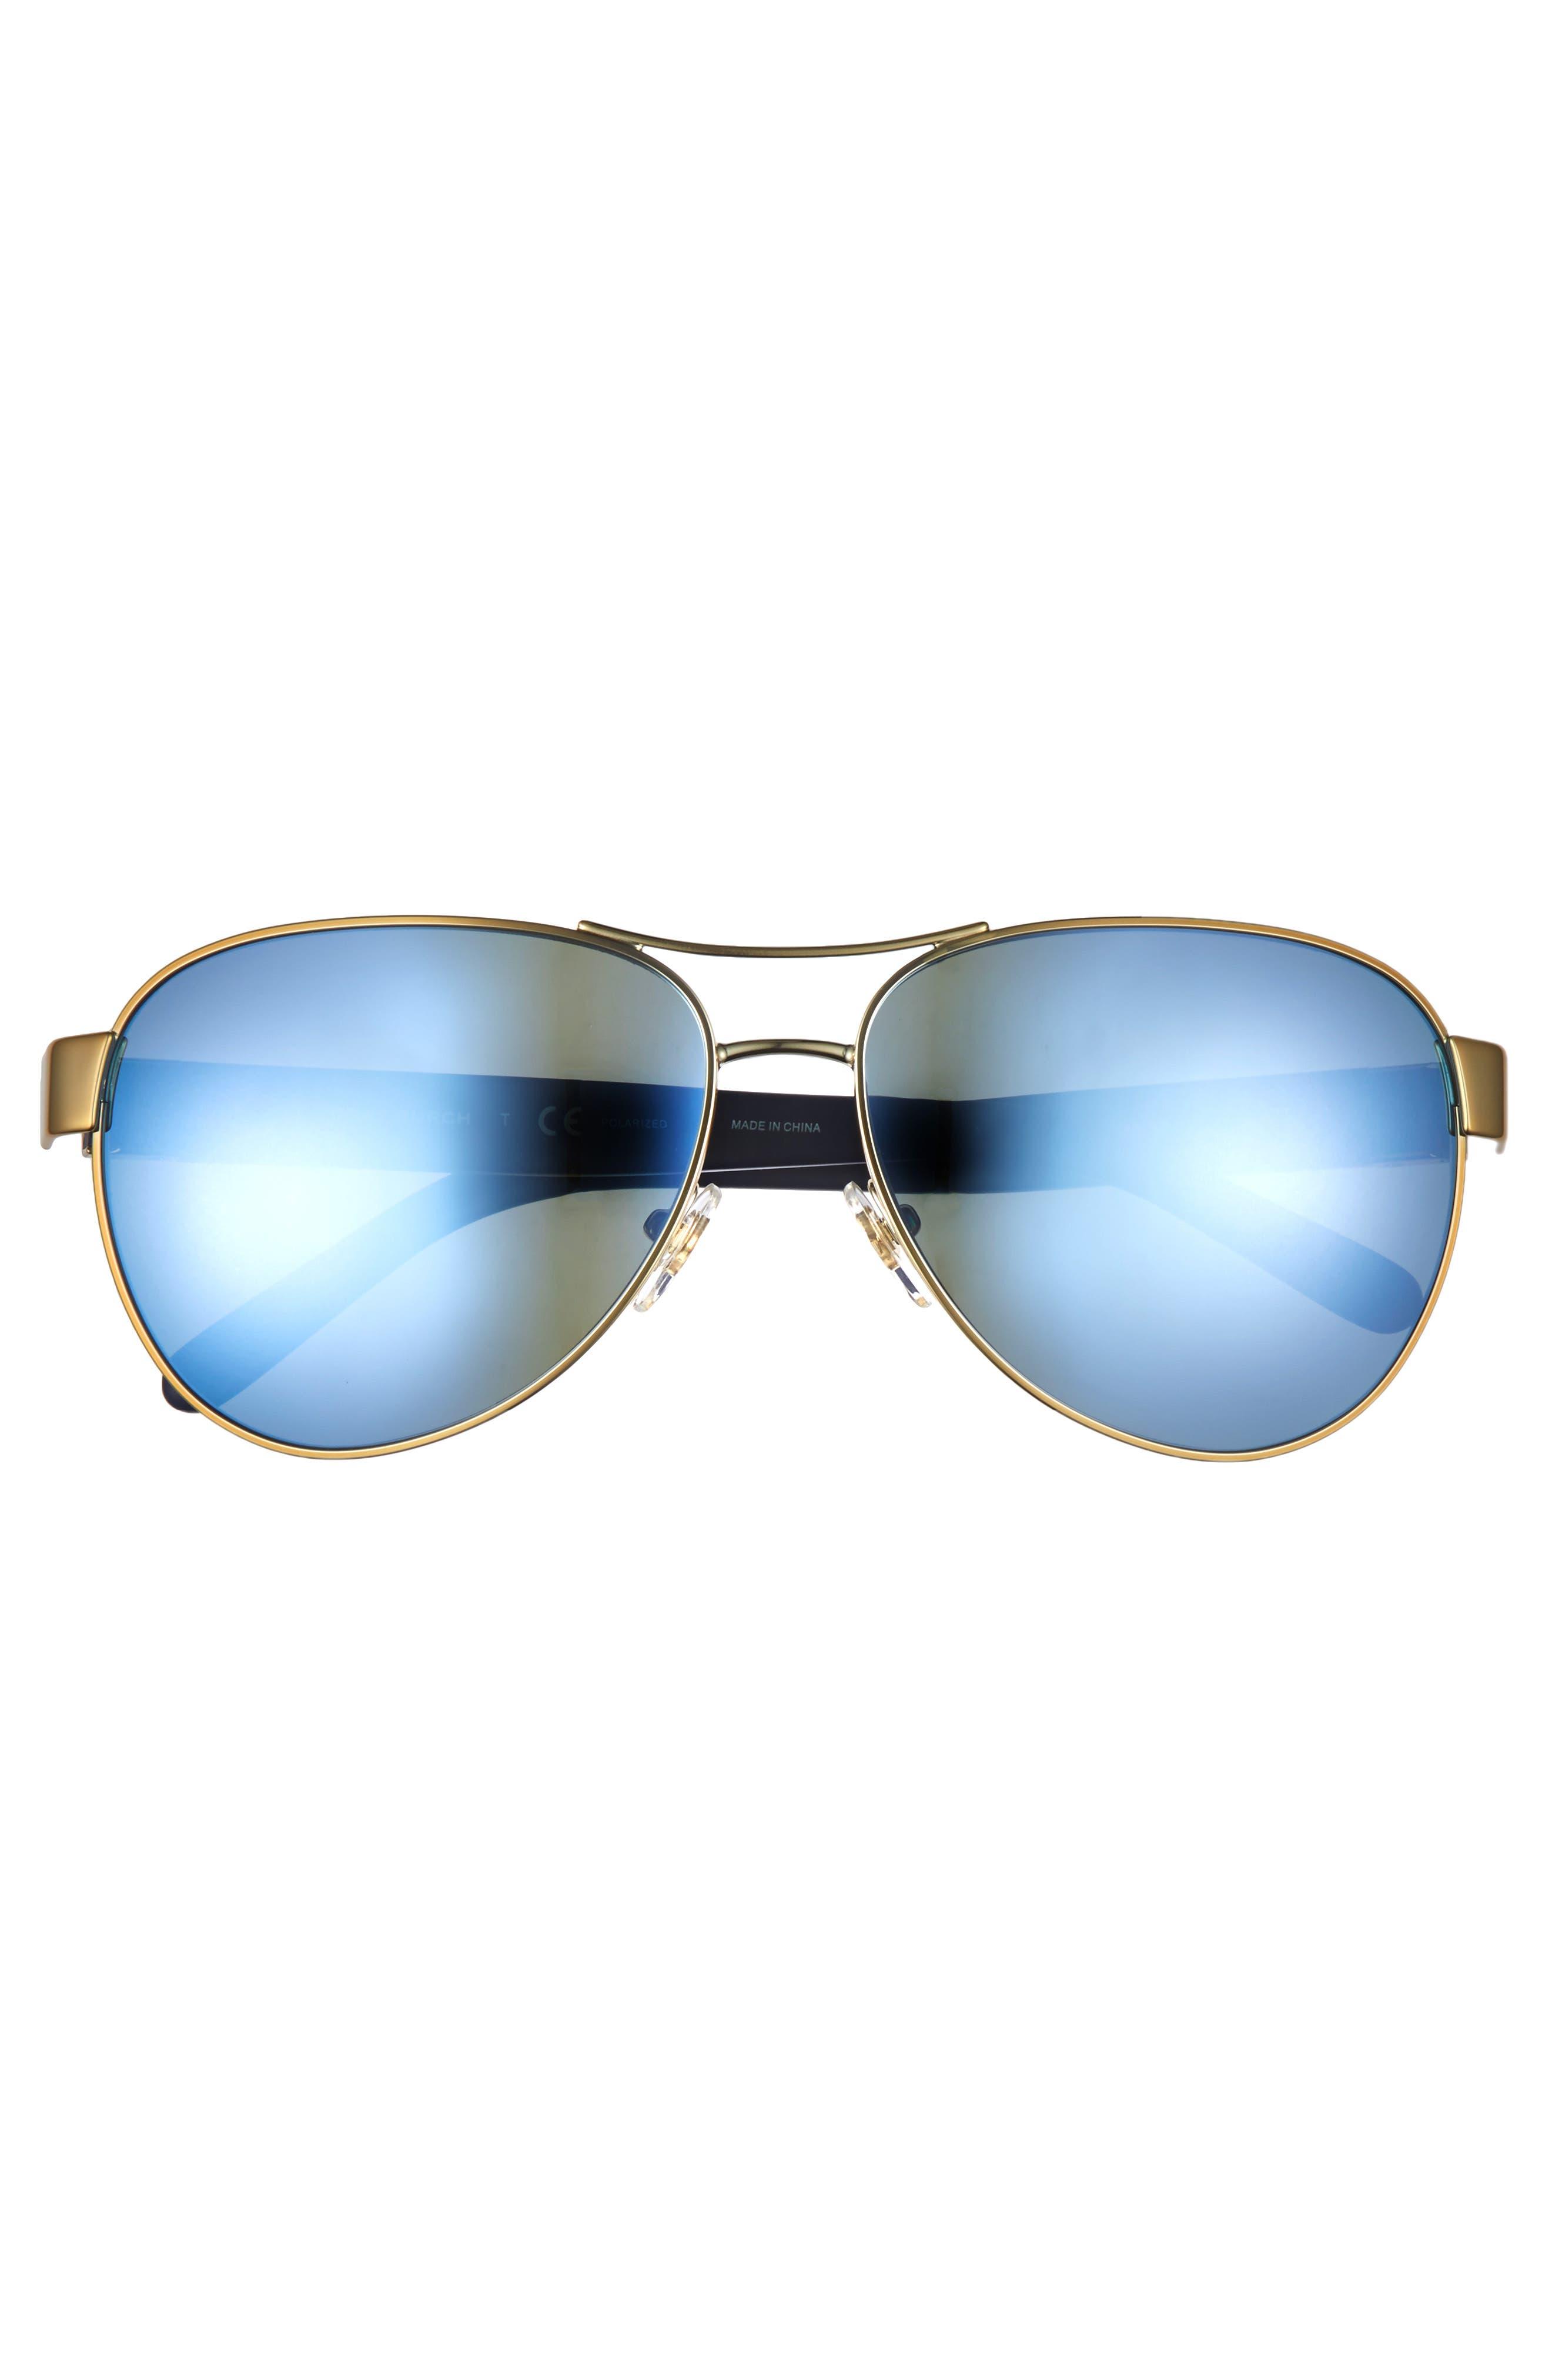 60mm Polarized Aviator Sunglasses,                             Alternate thumbnail 3, color,